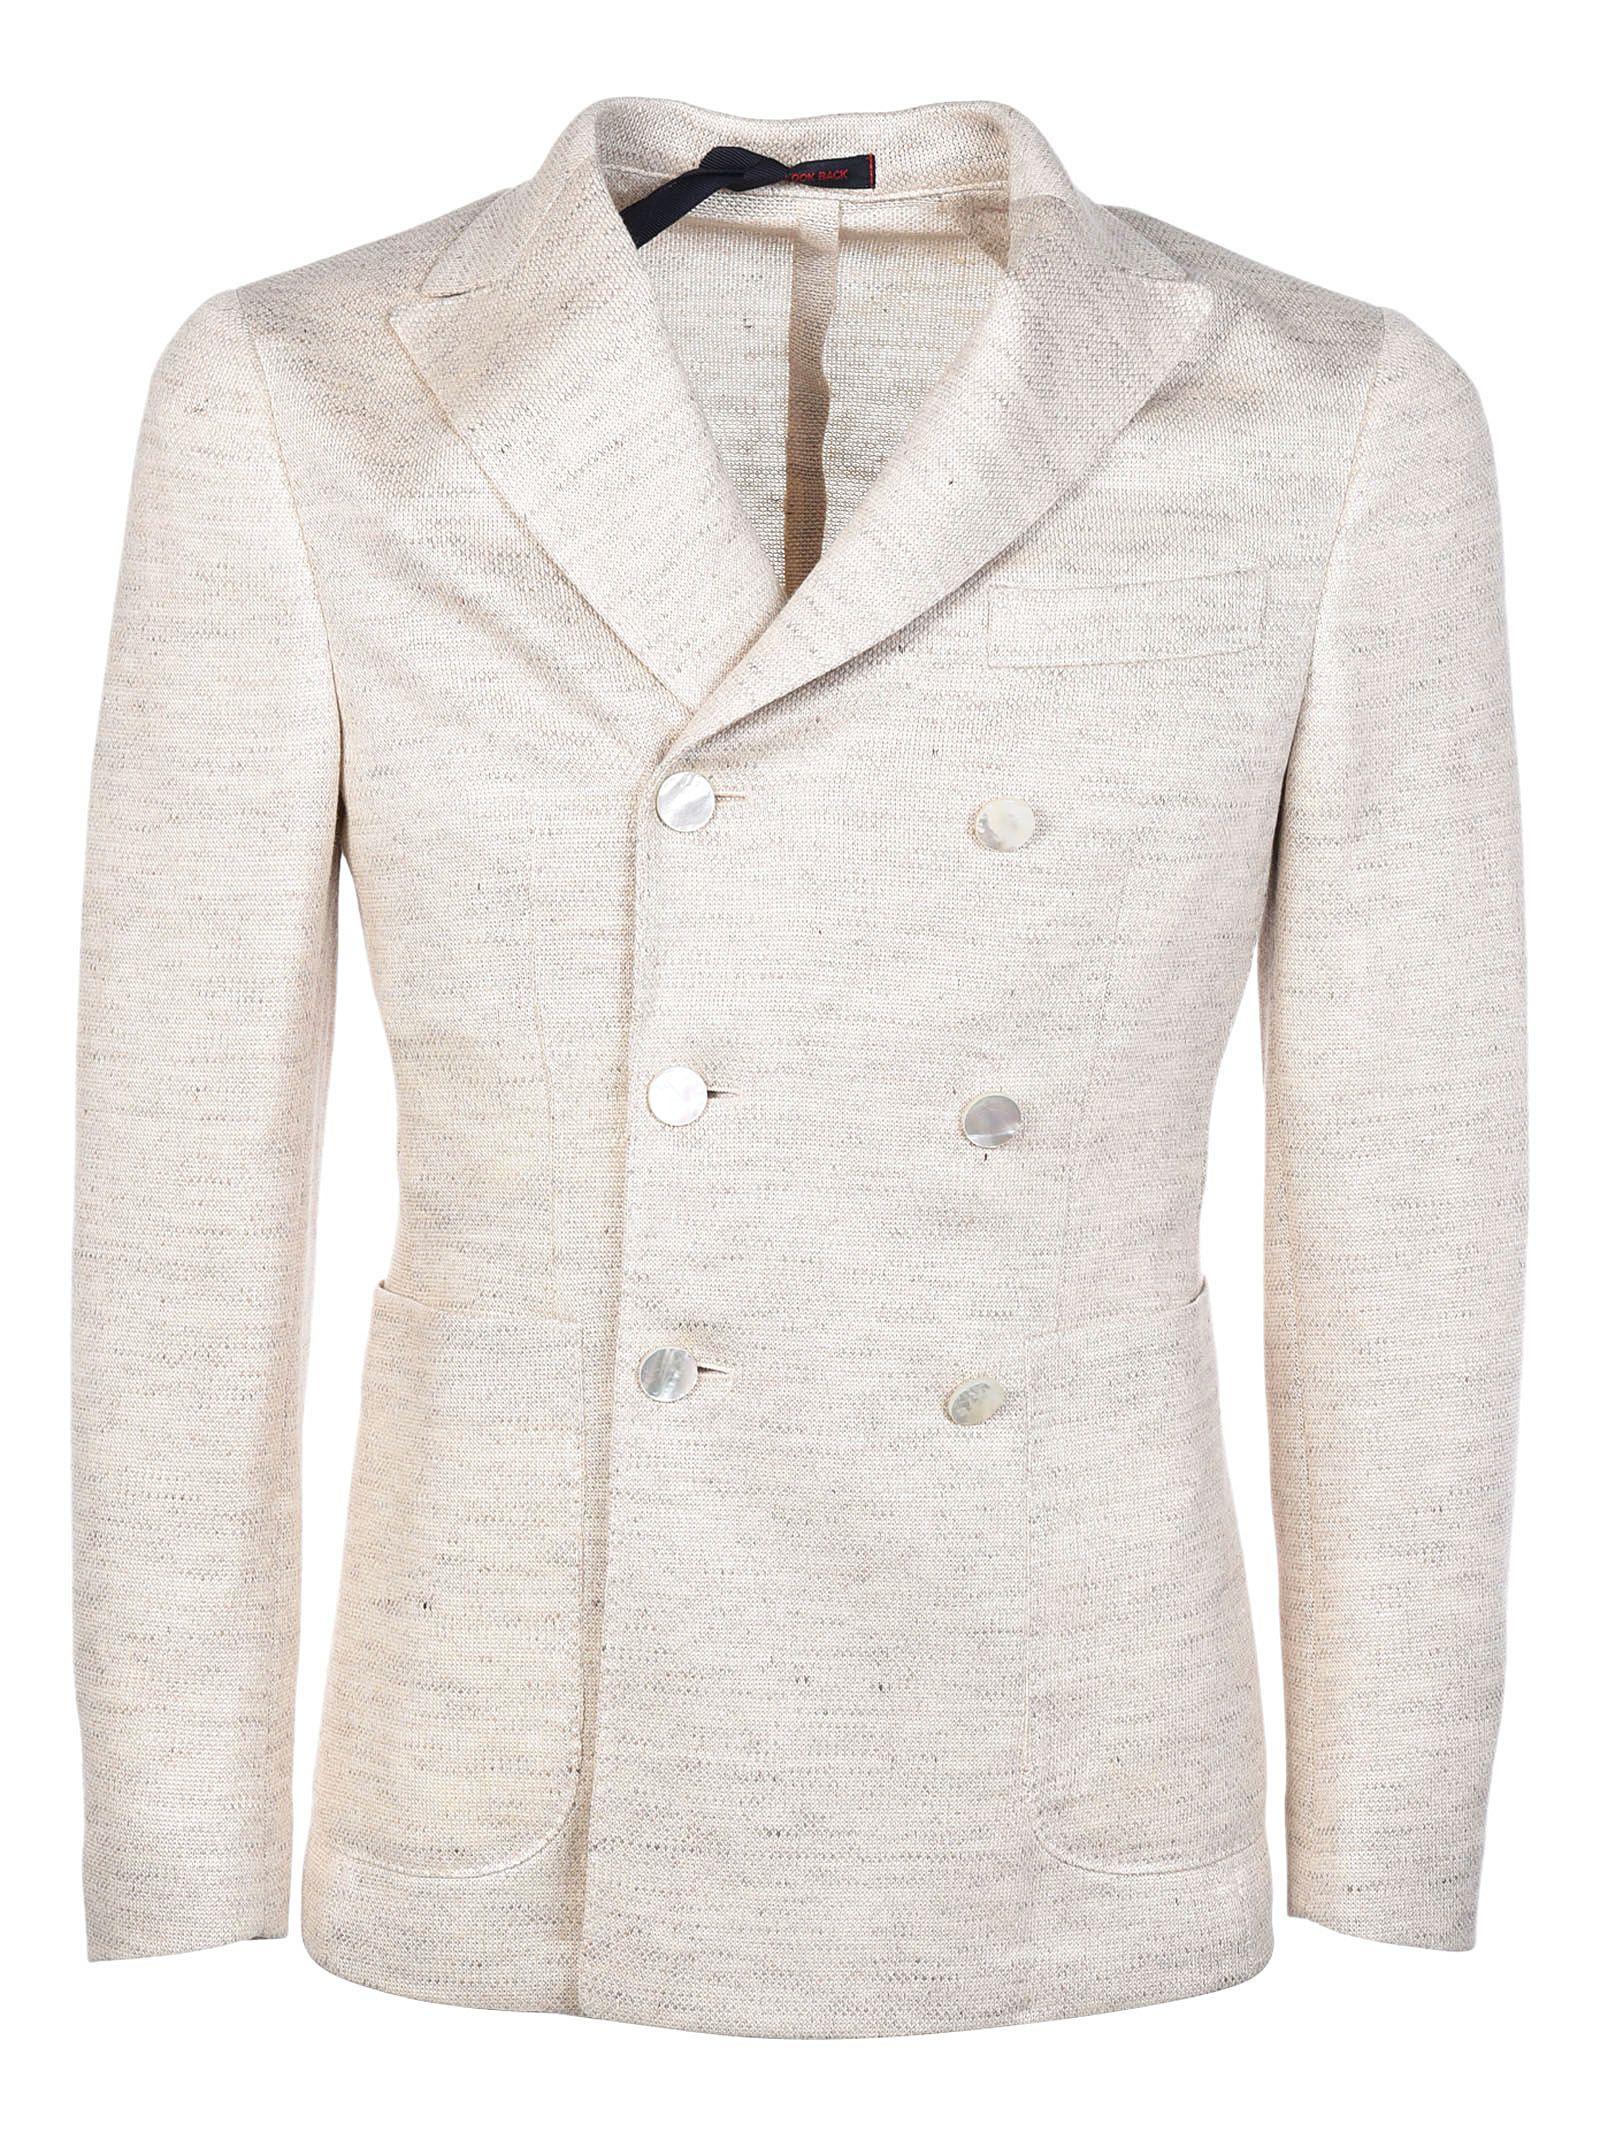 The Gigi Miro Pea Coat